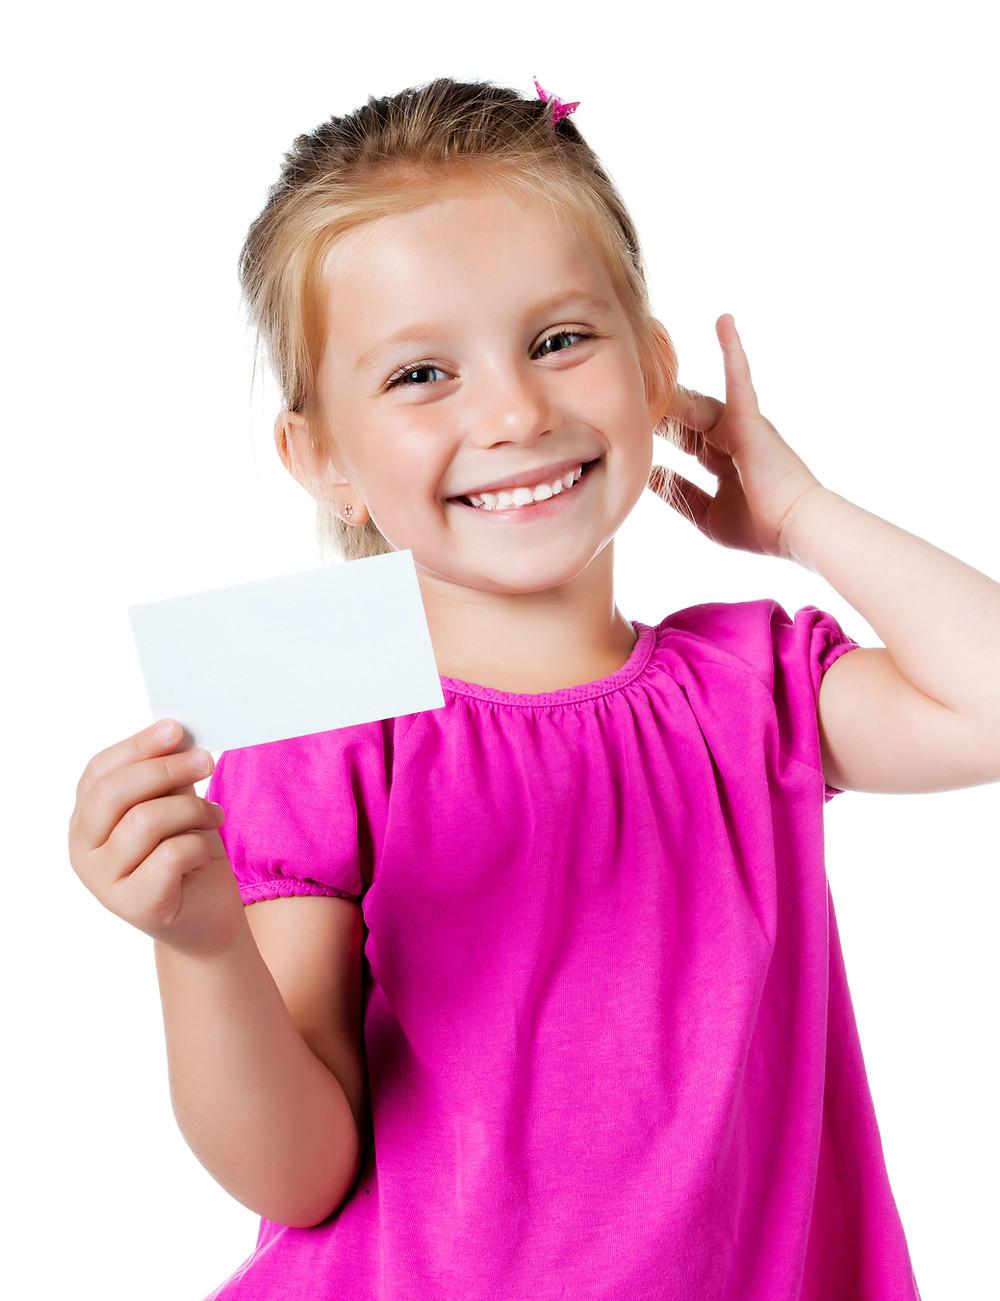 Speak Up! Encouraging Public Speaking In Your Child by Kathryn Lancioni, Ridgewood Moms